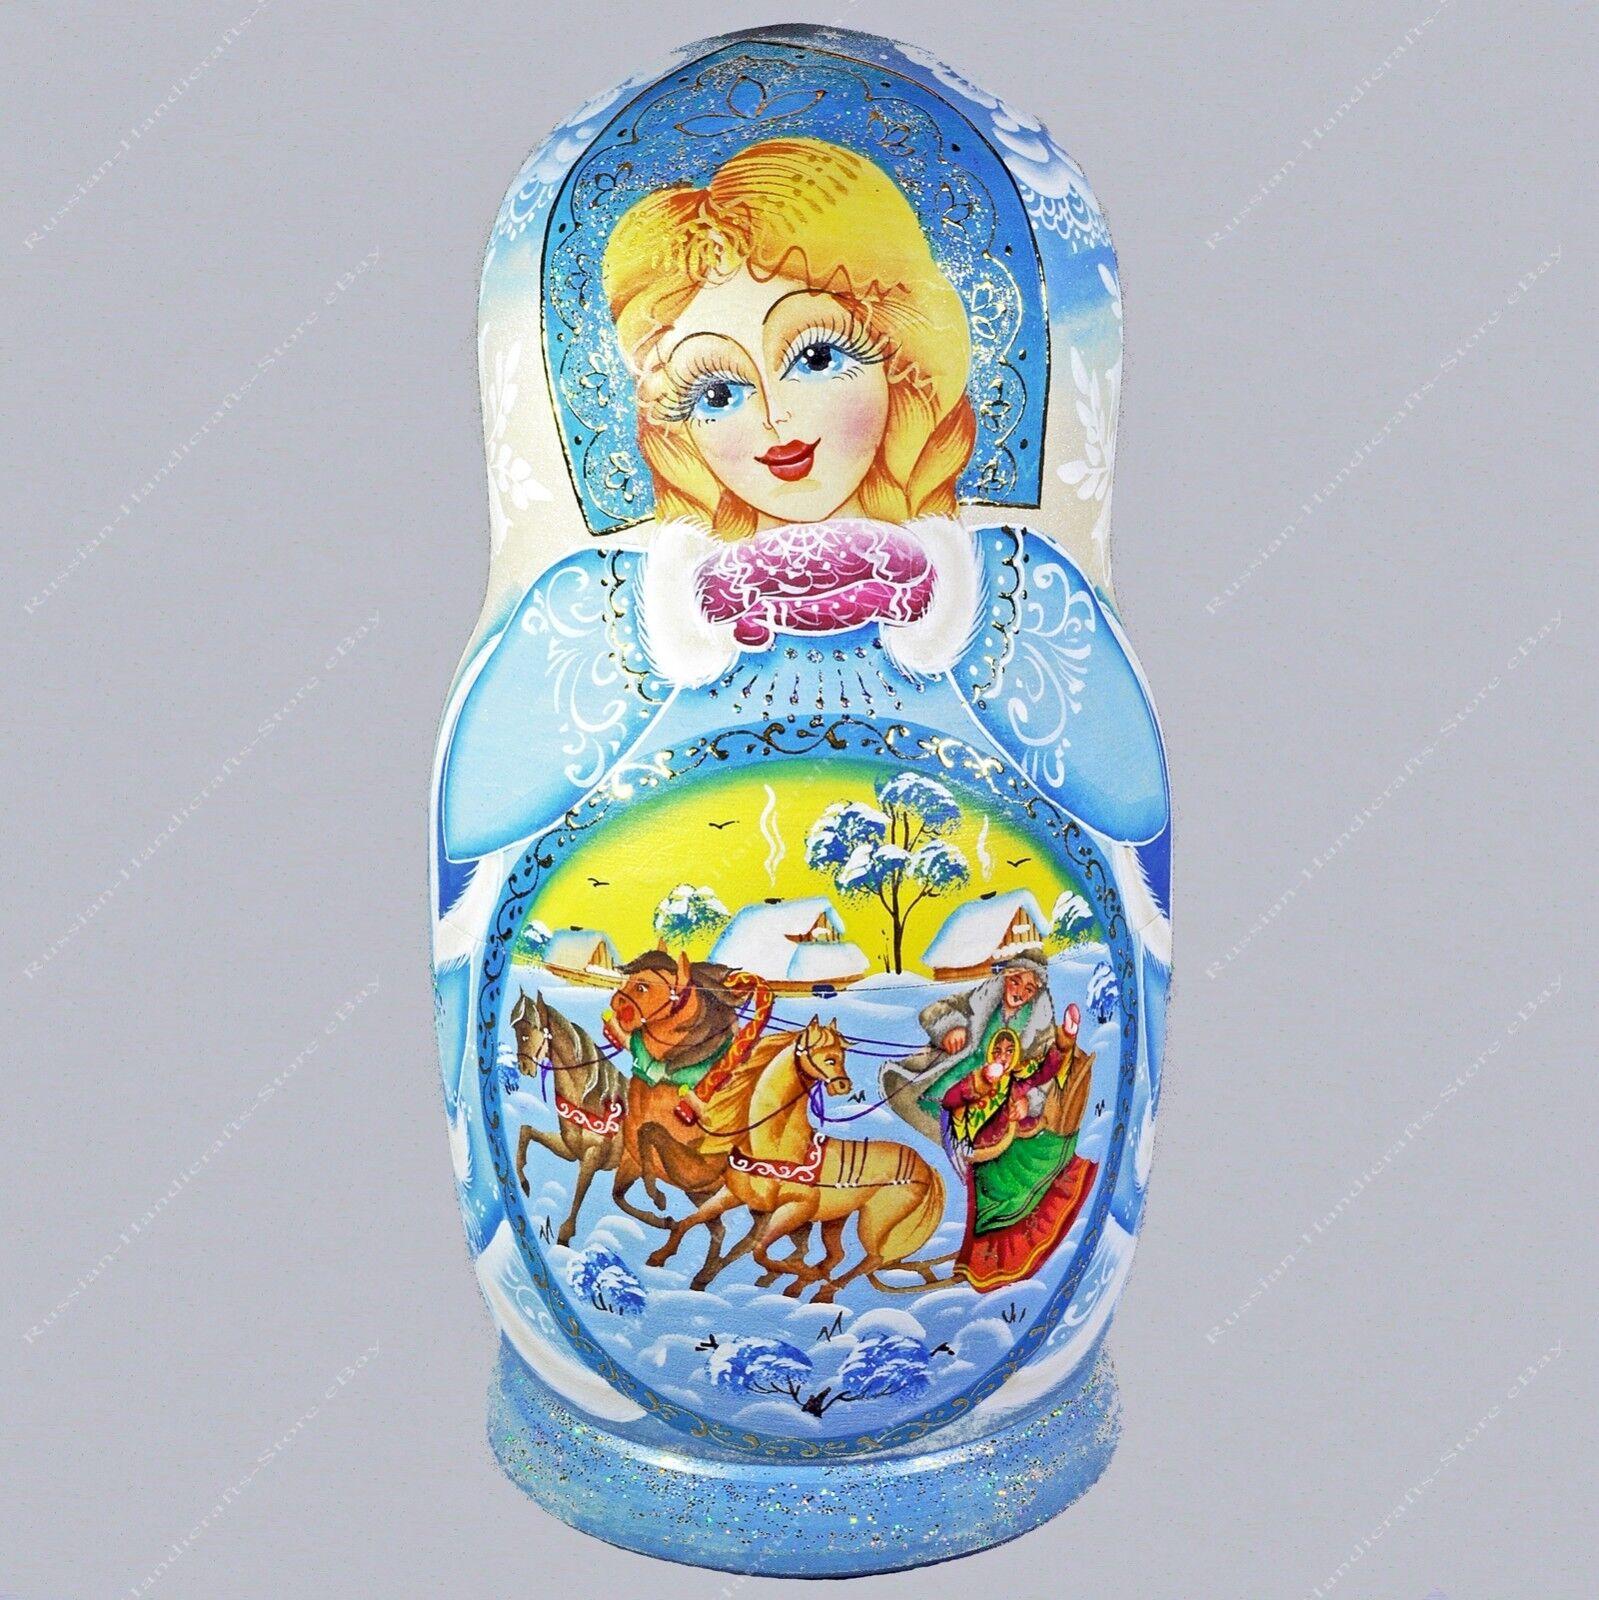 8  GORGEOUS RUSSIAN WINTER MATRYOSHKA NESTING bambolaS  FEDOSKINO MINIATURES 7PCS  vendita di offerte